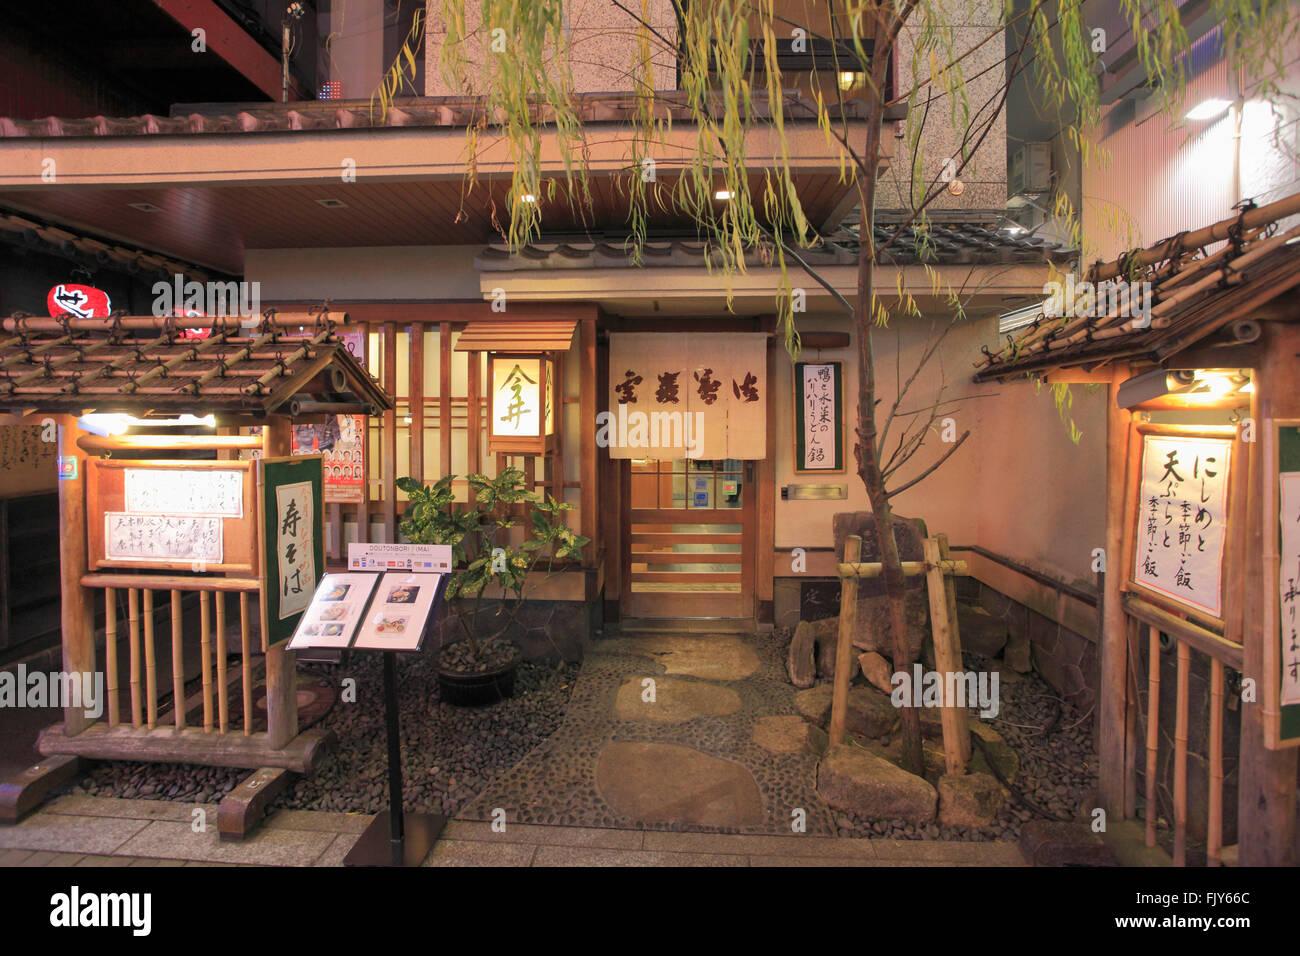 Japan Osaka Minami Dotombori Traditional Restaurant Stock Photo Alamy